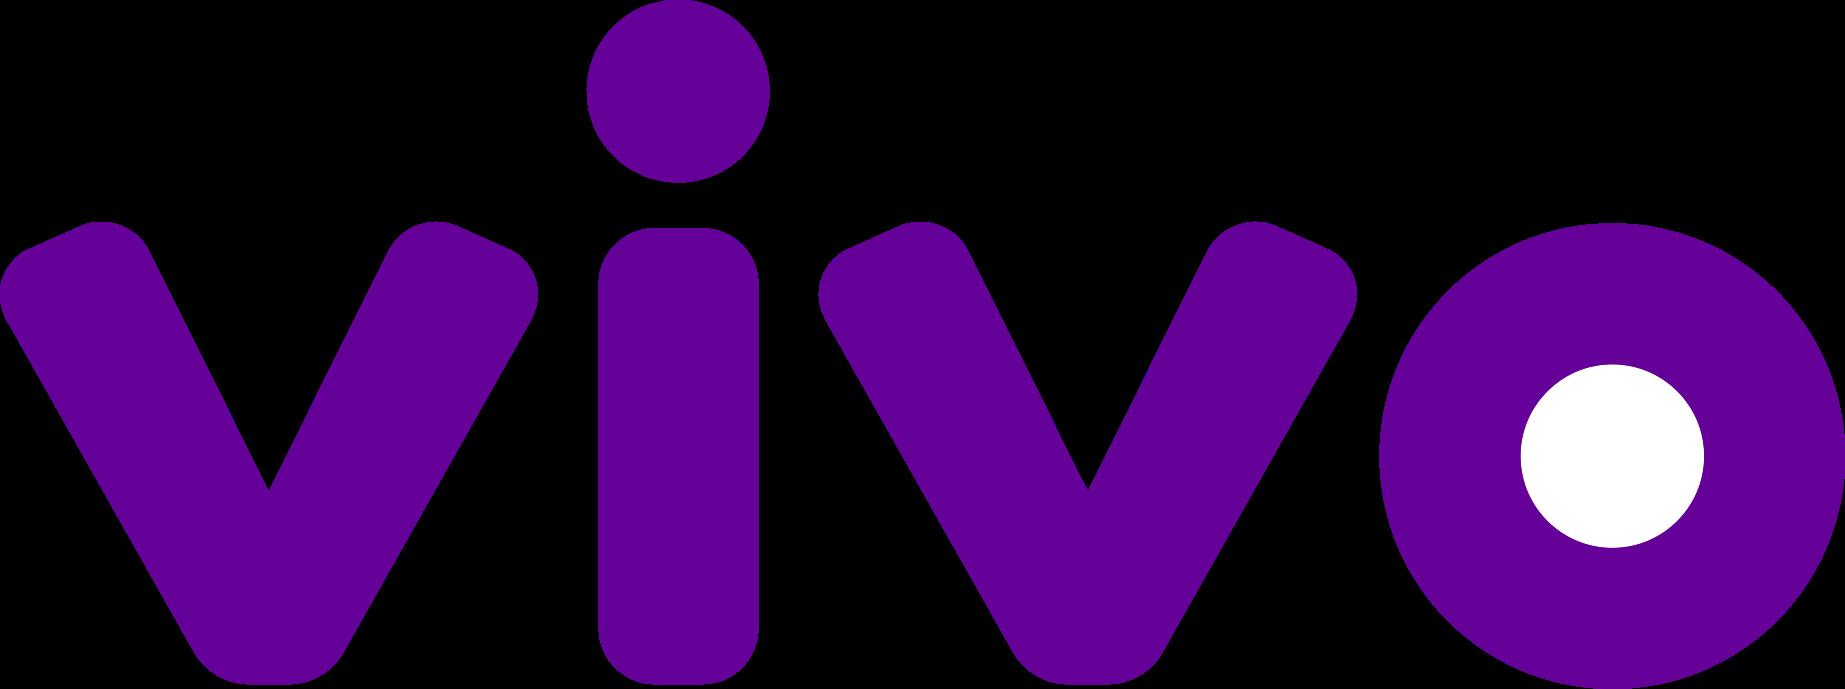 File:Logo VIVO.svg.